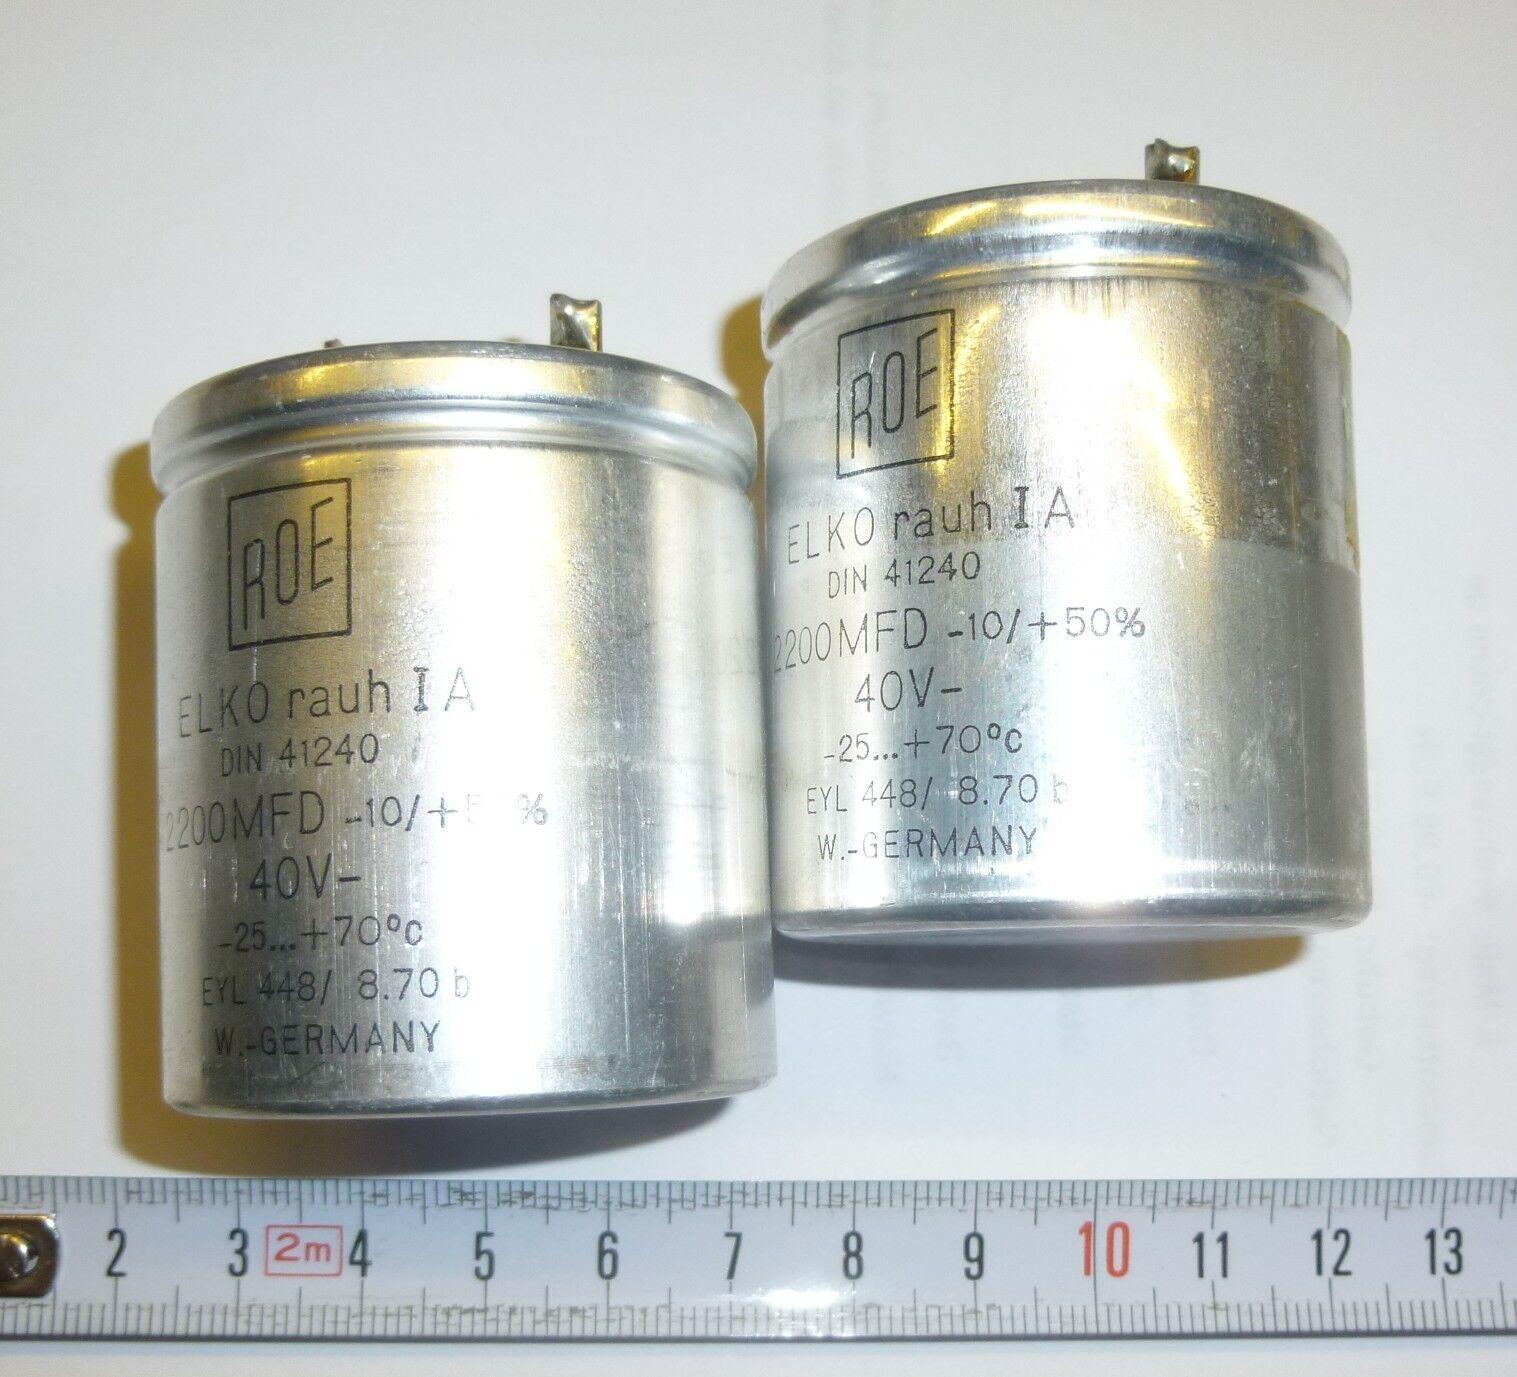 5 St Roe Mkc1813 Folien Kondensator 47nf 400v 10 Elko 10uf 250v 2 X 2200 F 40 Volt